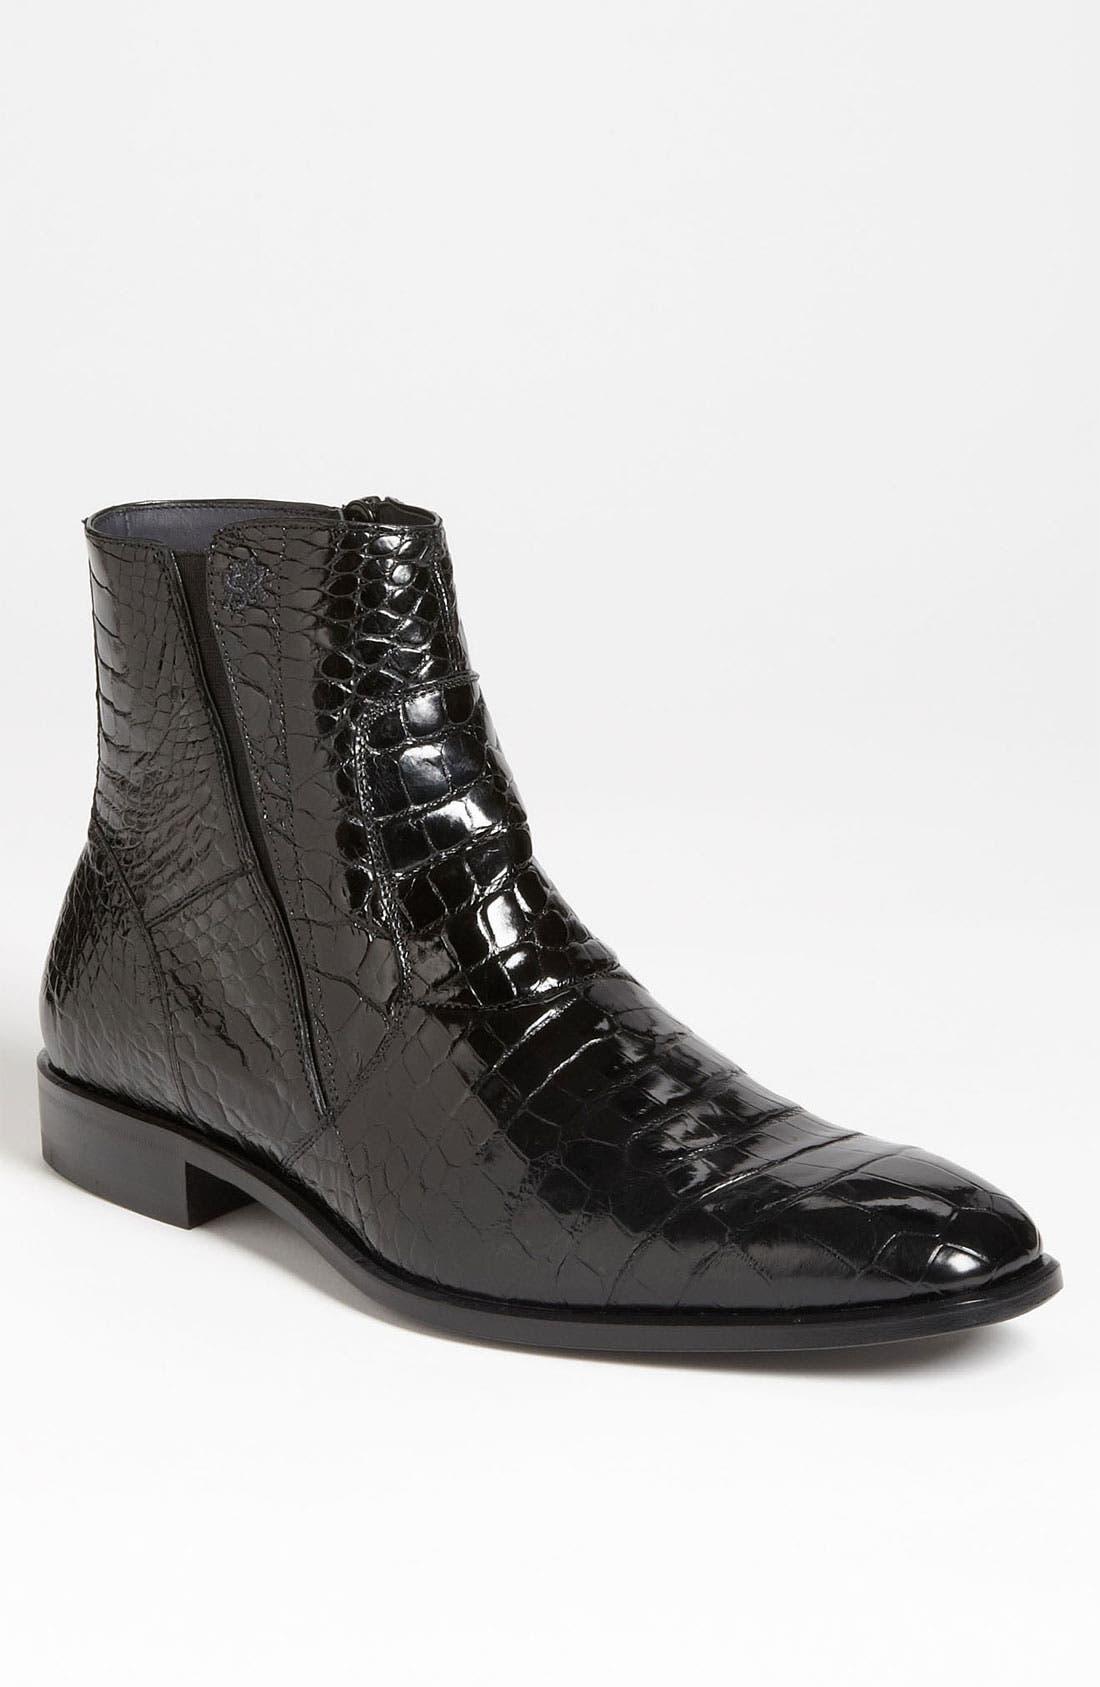 'Belucci' Alligator Boot,                         Main,                         color, 001